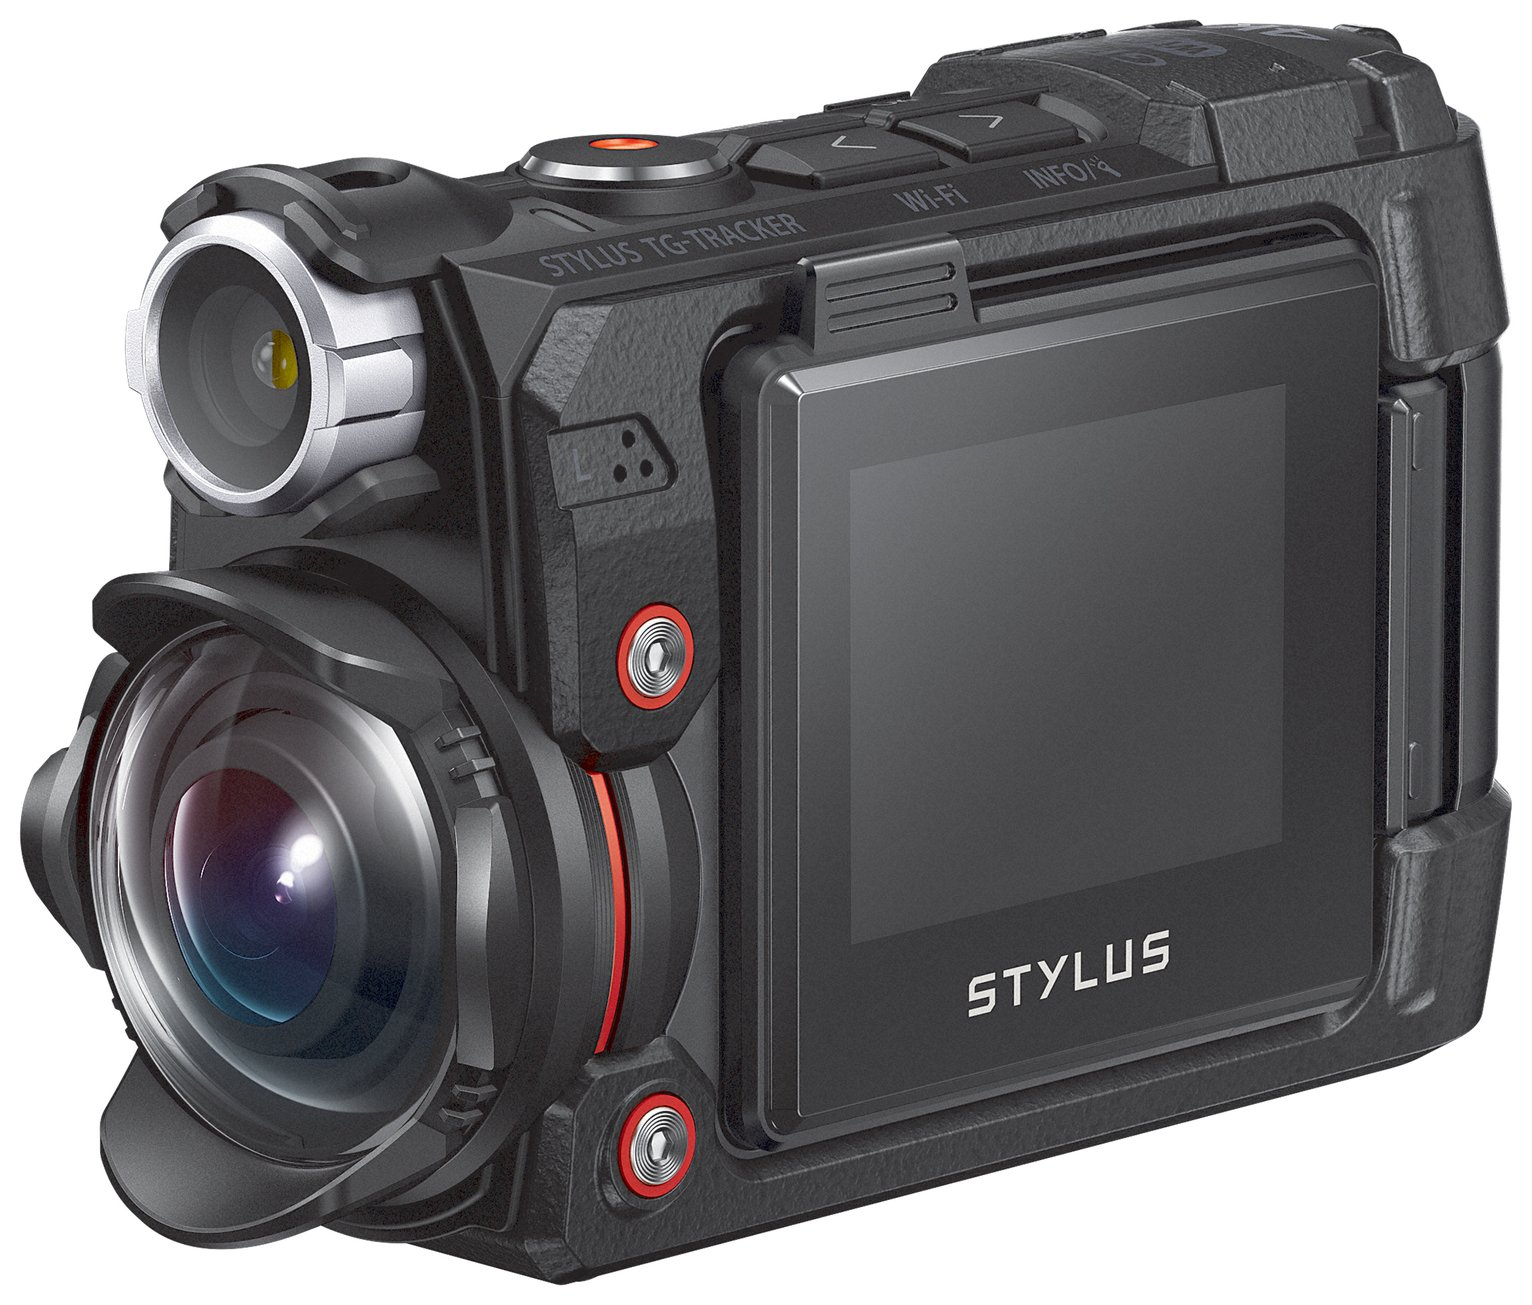 Olympus TG-Tracker 8MP Tough Camera - Black